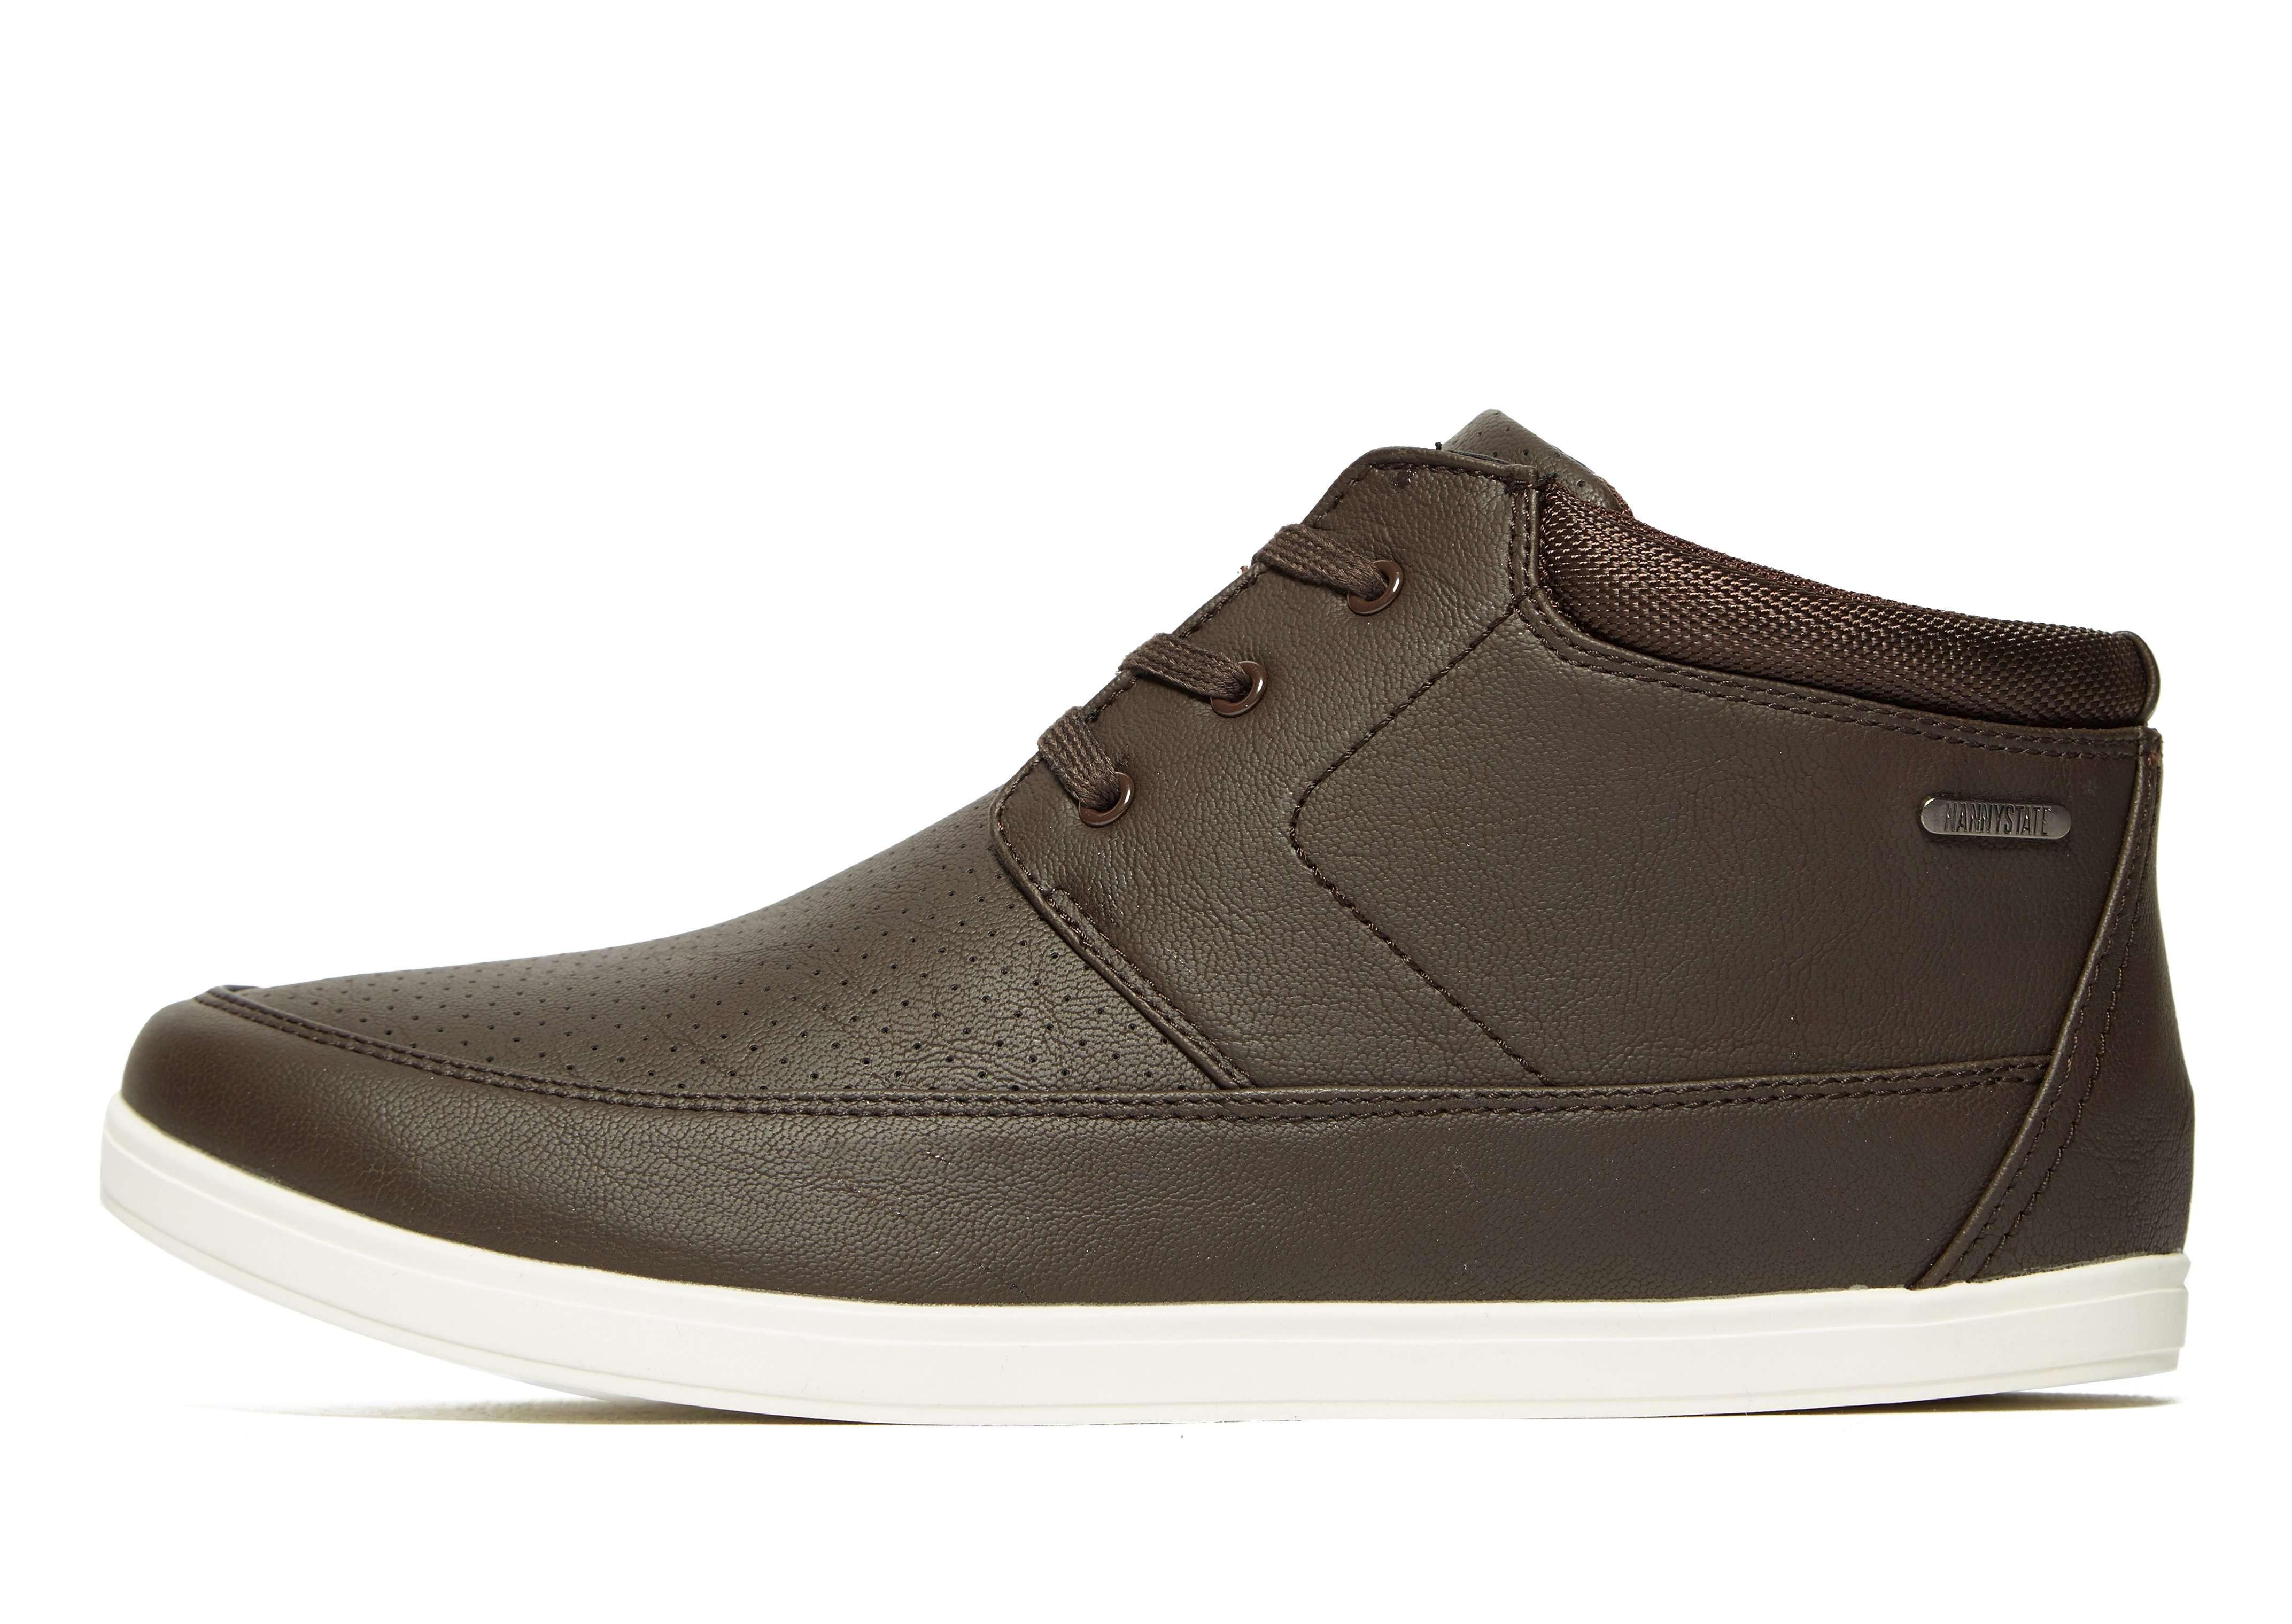 Nanny State Michigan - Men's Skate Shoes - Brown 299356